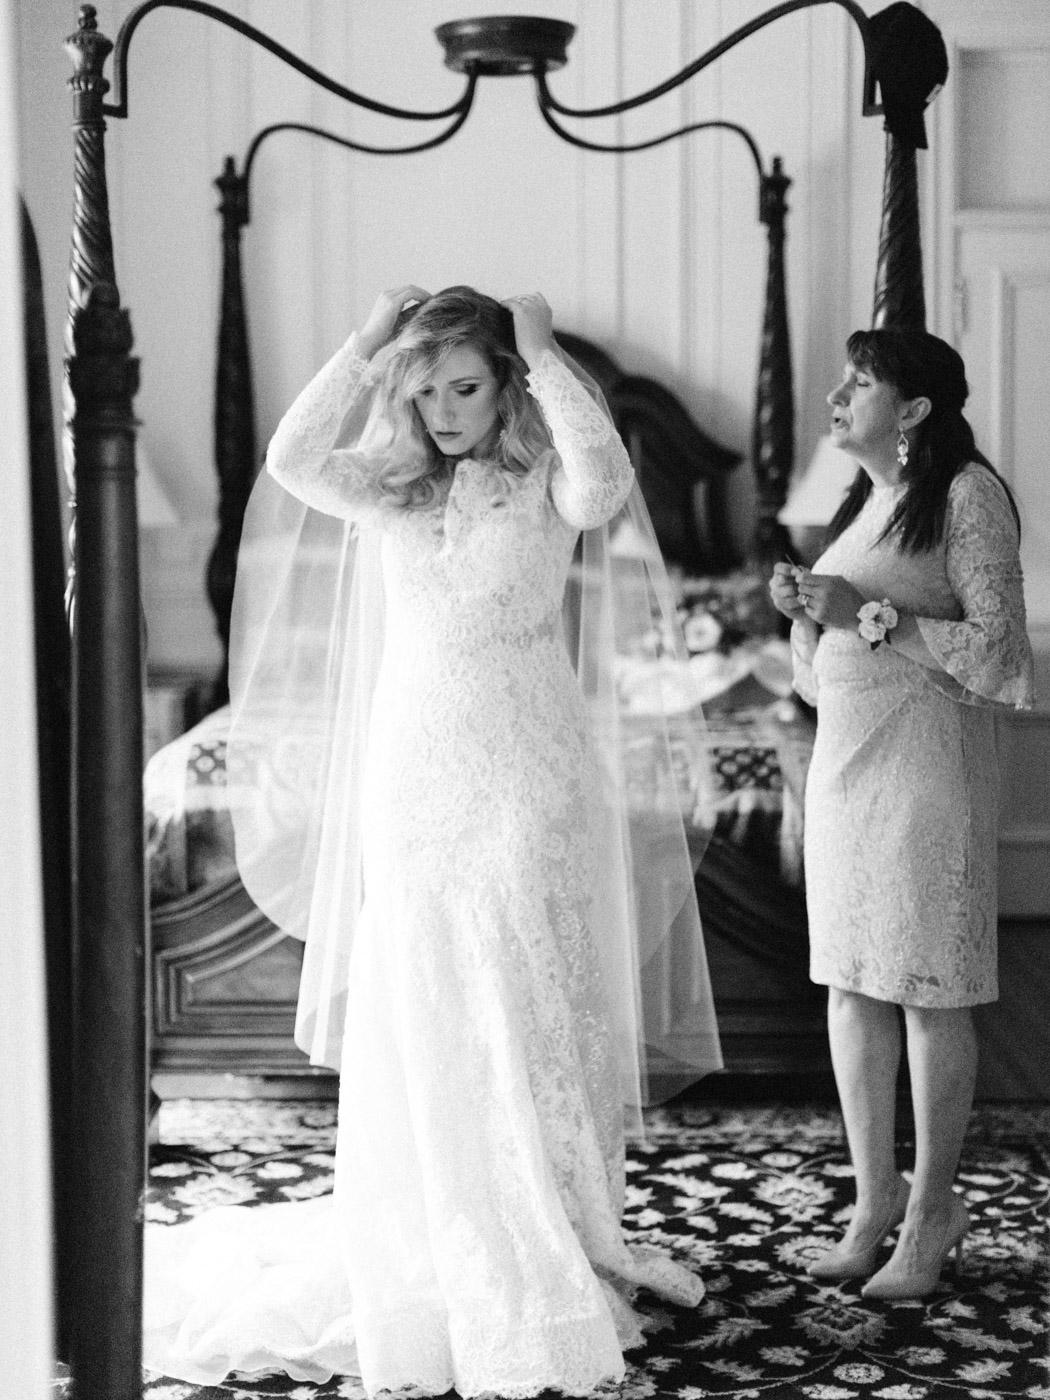 Toronto-wedding-photographer-intimate-classic-fine-art-elopement-ottawa24.jpg